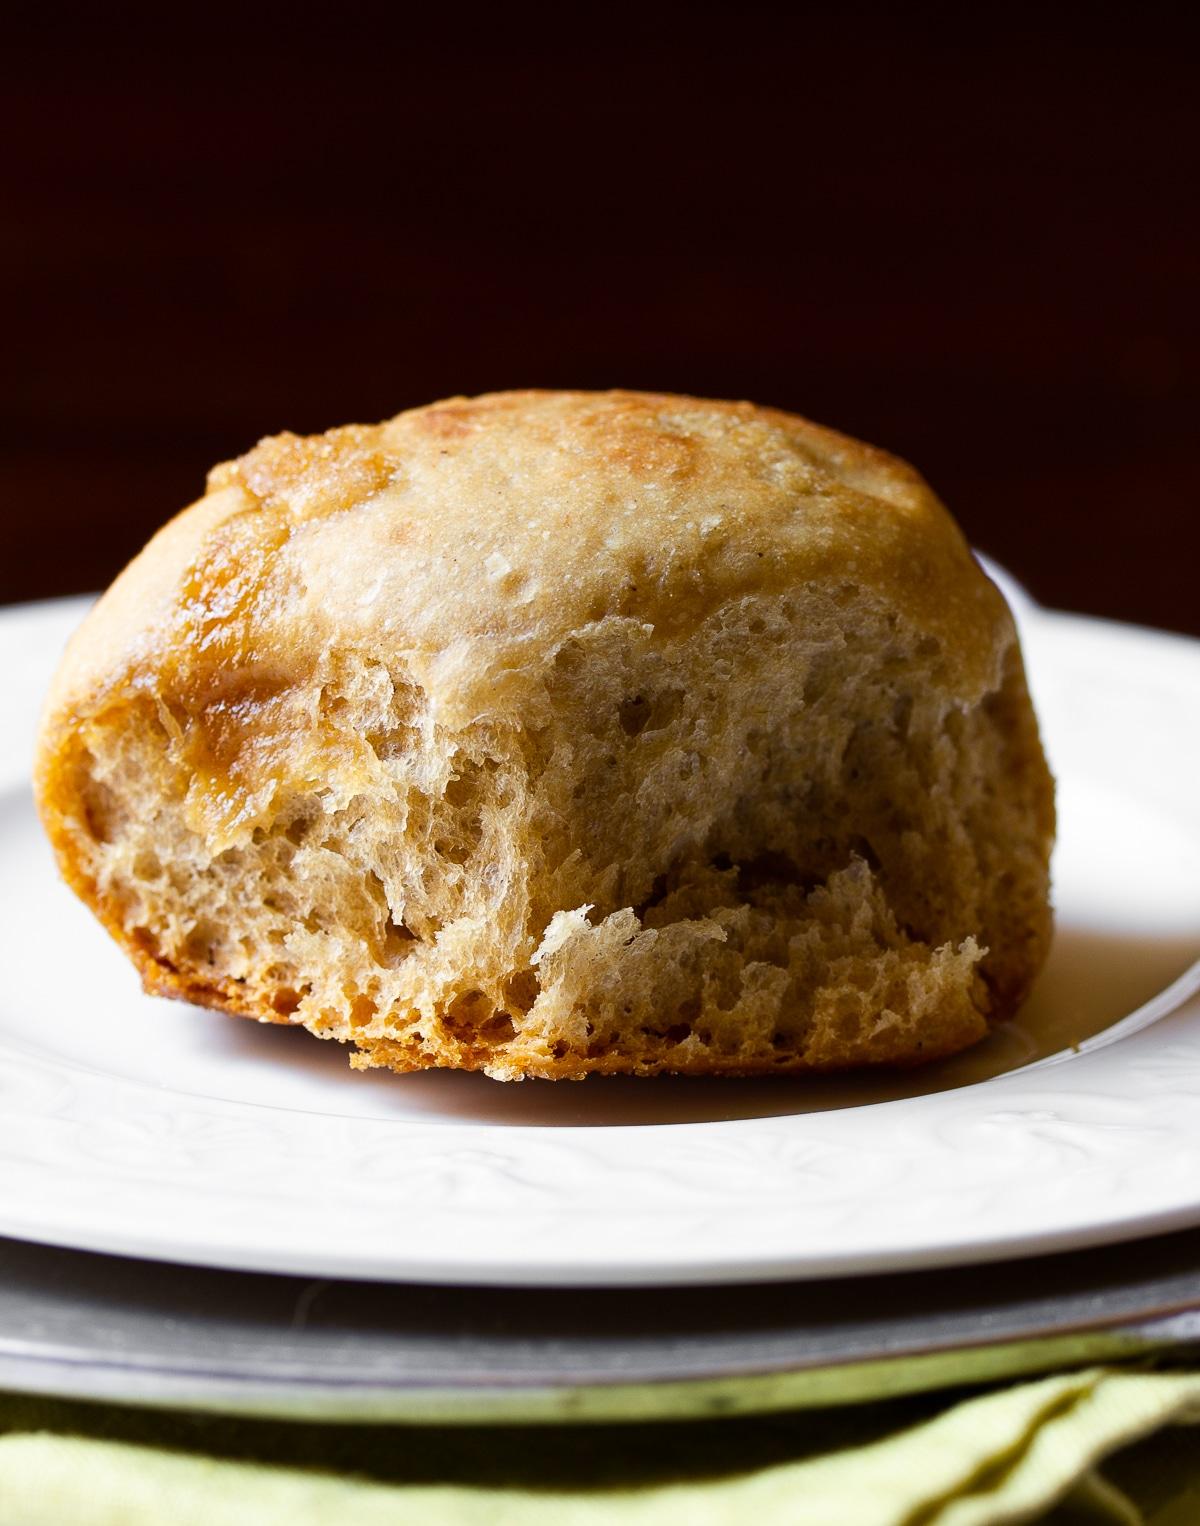 Crockpot Apple Butter Yeast Rolls Recipe #ASpicyPerspective #crockpot #slowcooker #thanksgiving #recipes #bread